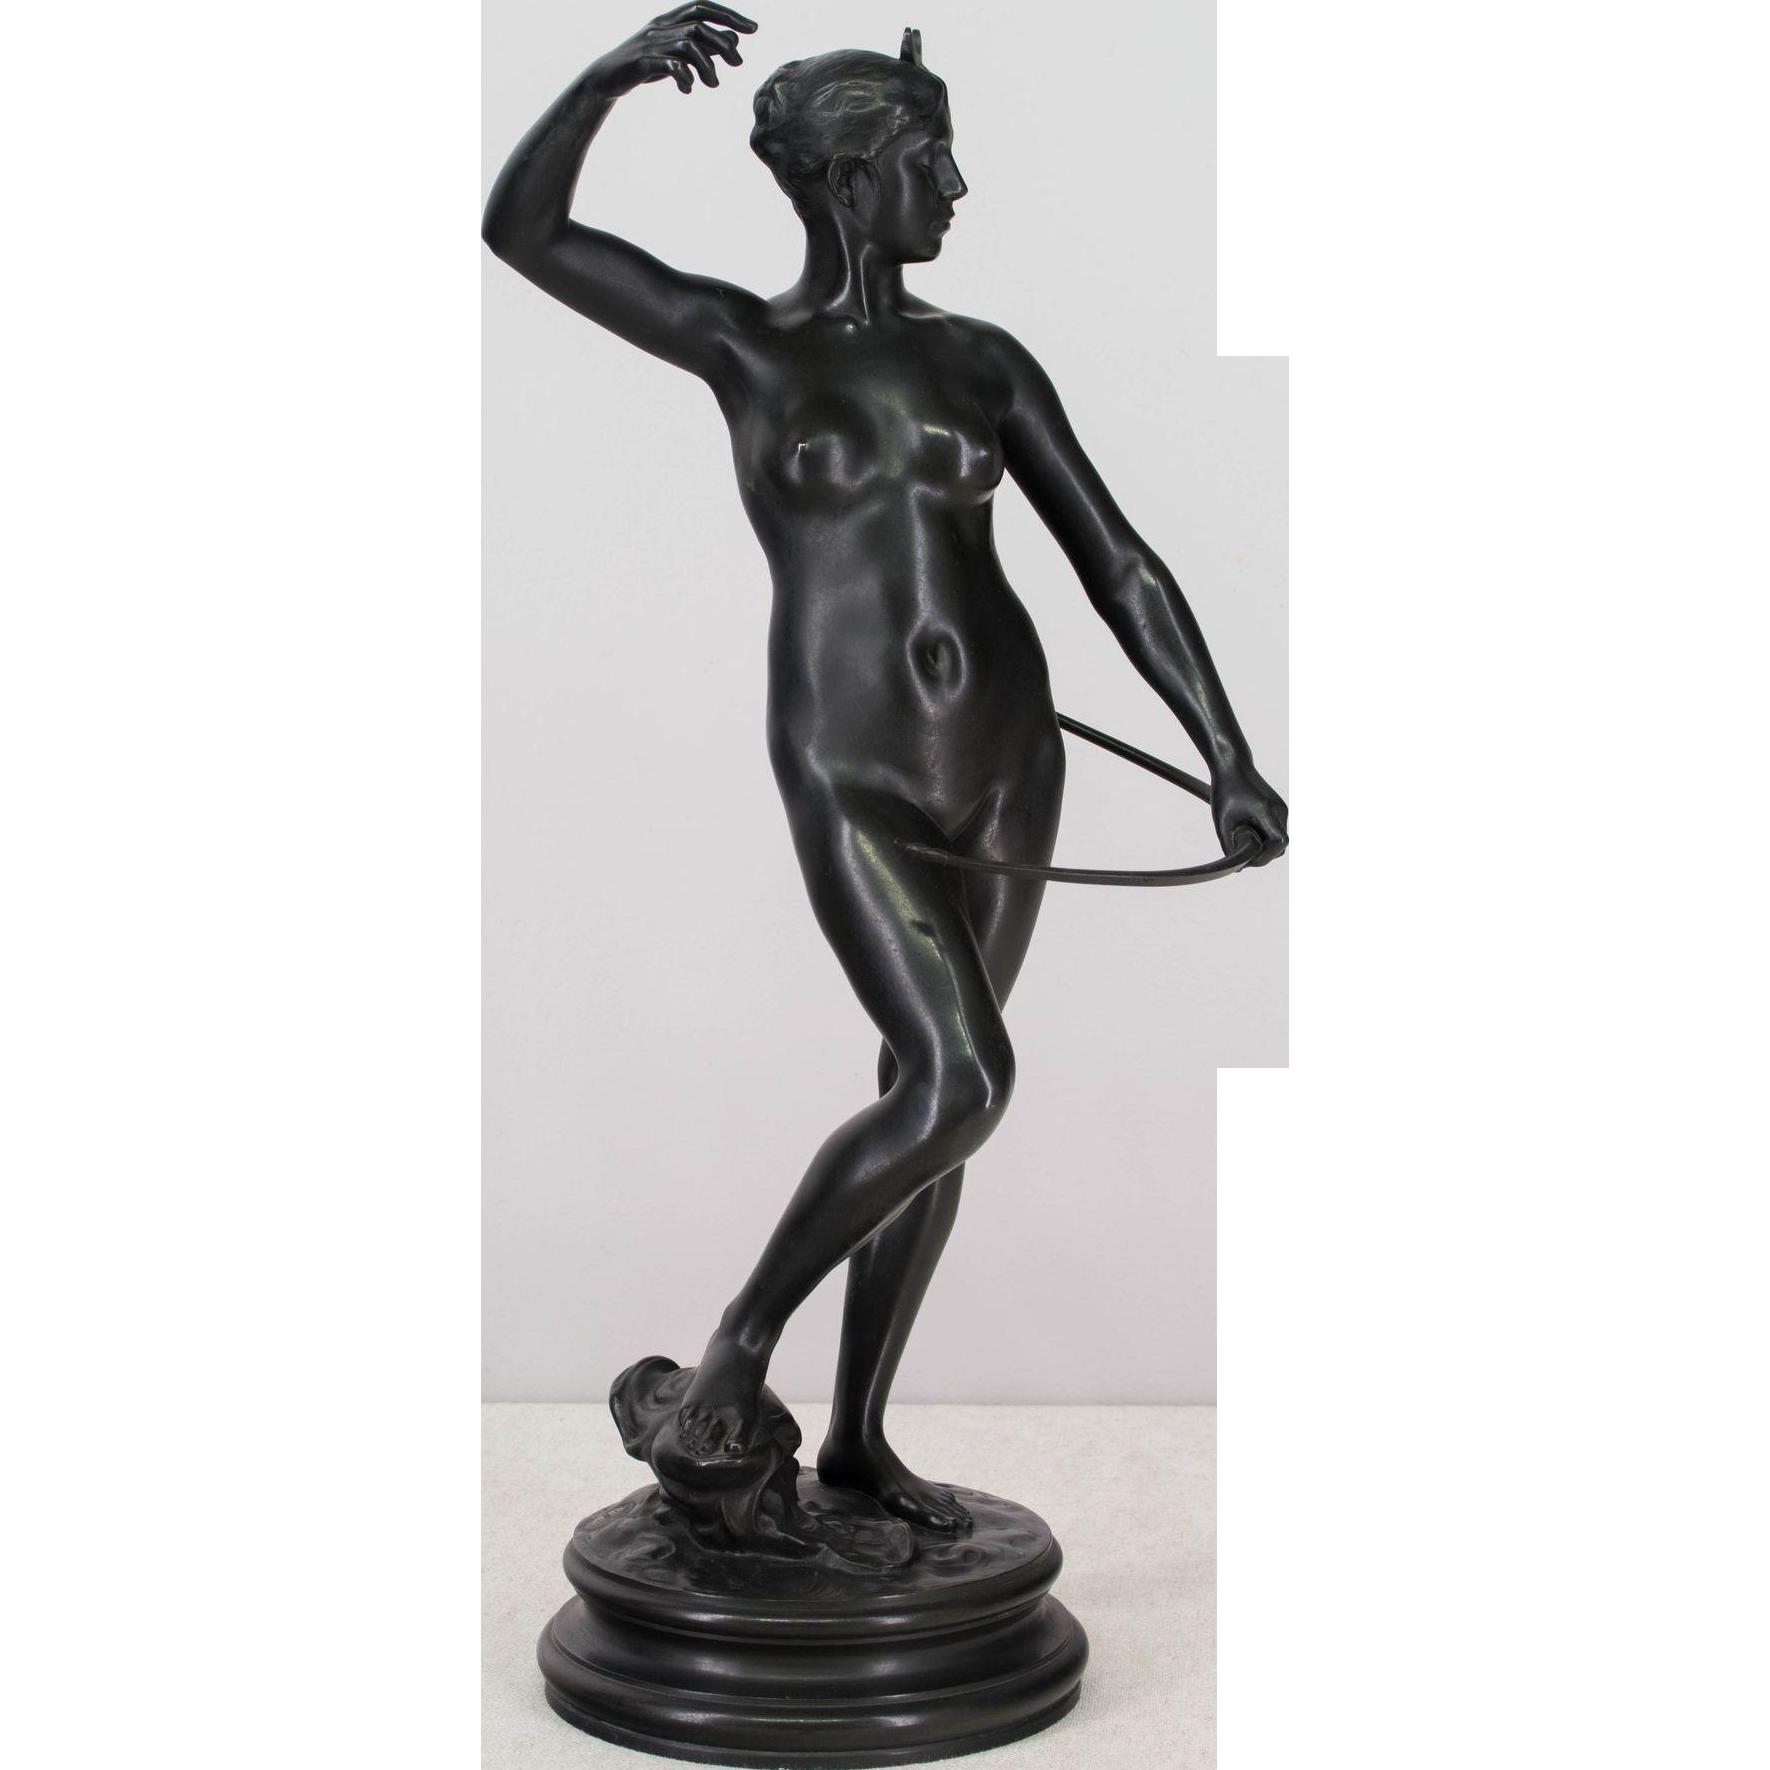 19th c. Bronze of Diana the Huntress